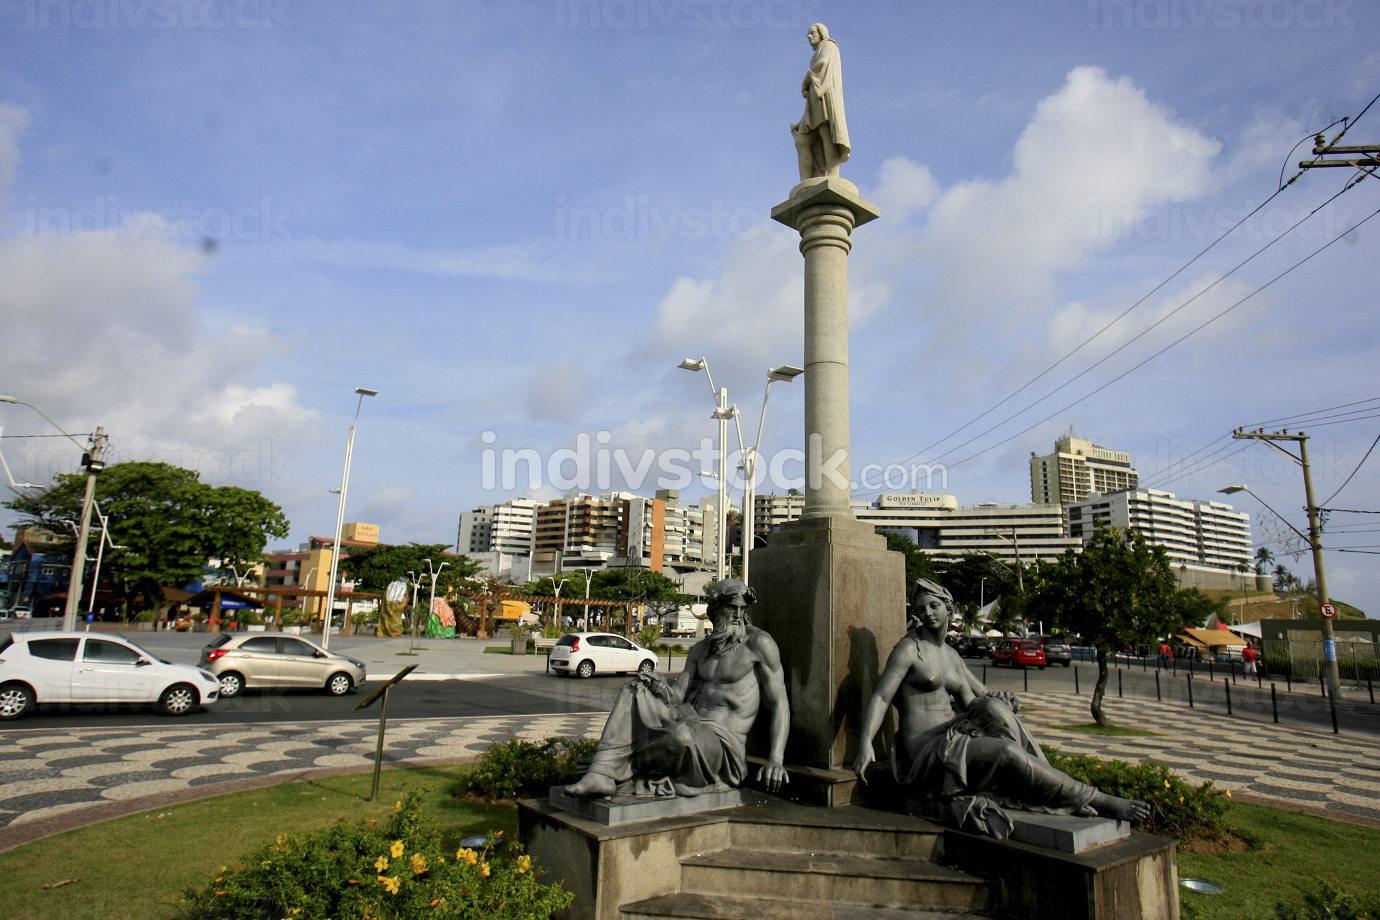 salvador, bahia Brazil, december 28, 2016, sculptures are seen in the Largo da Mariquita region in the Rio Vermelho neighborhood in the city of Salvador.